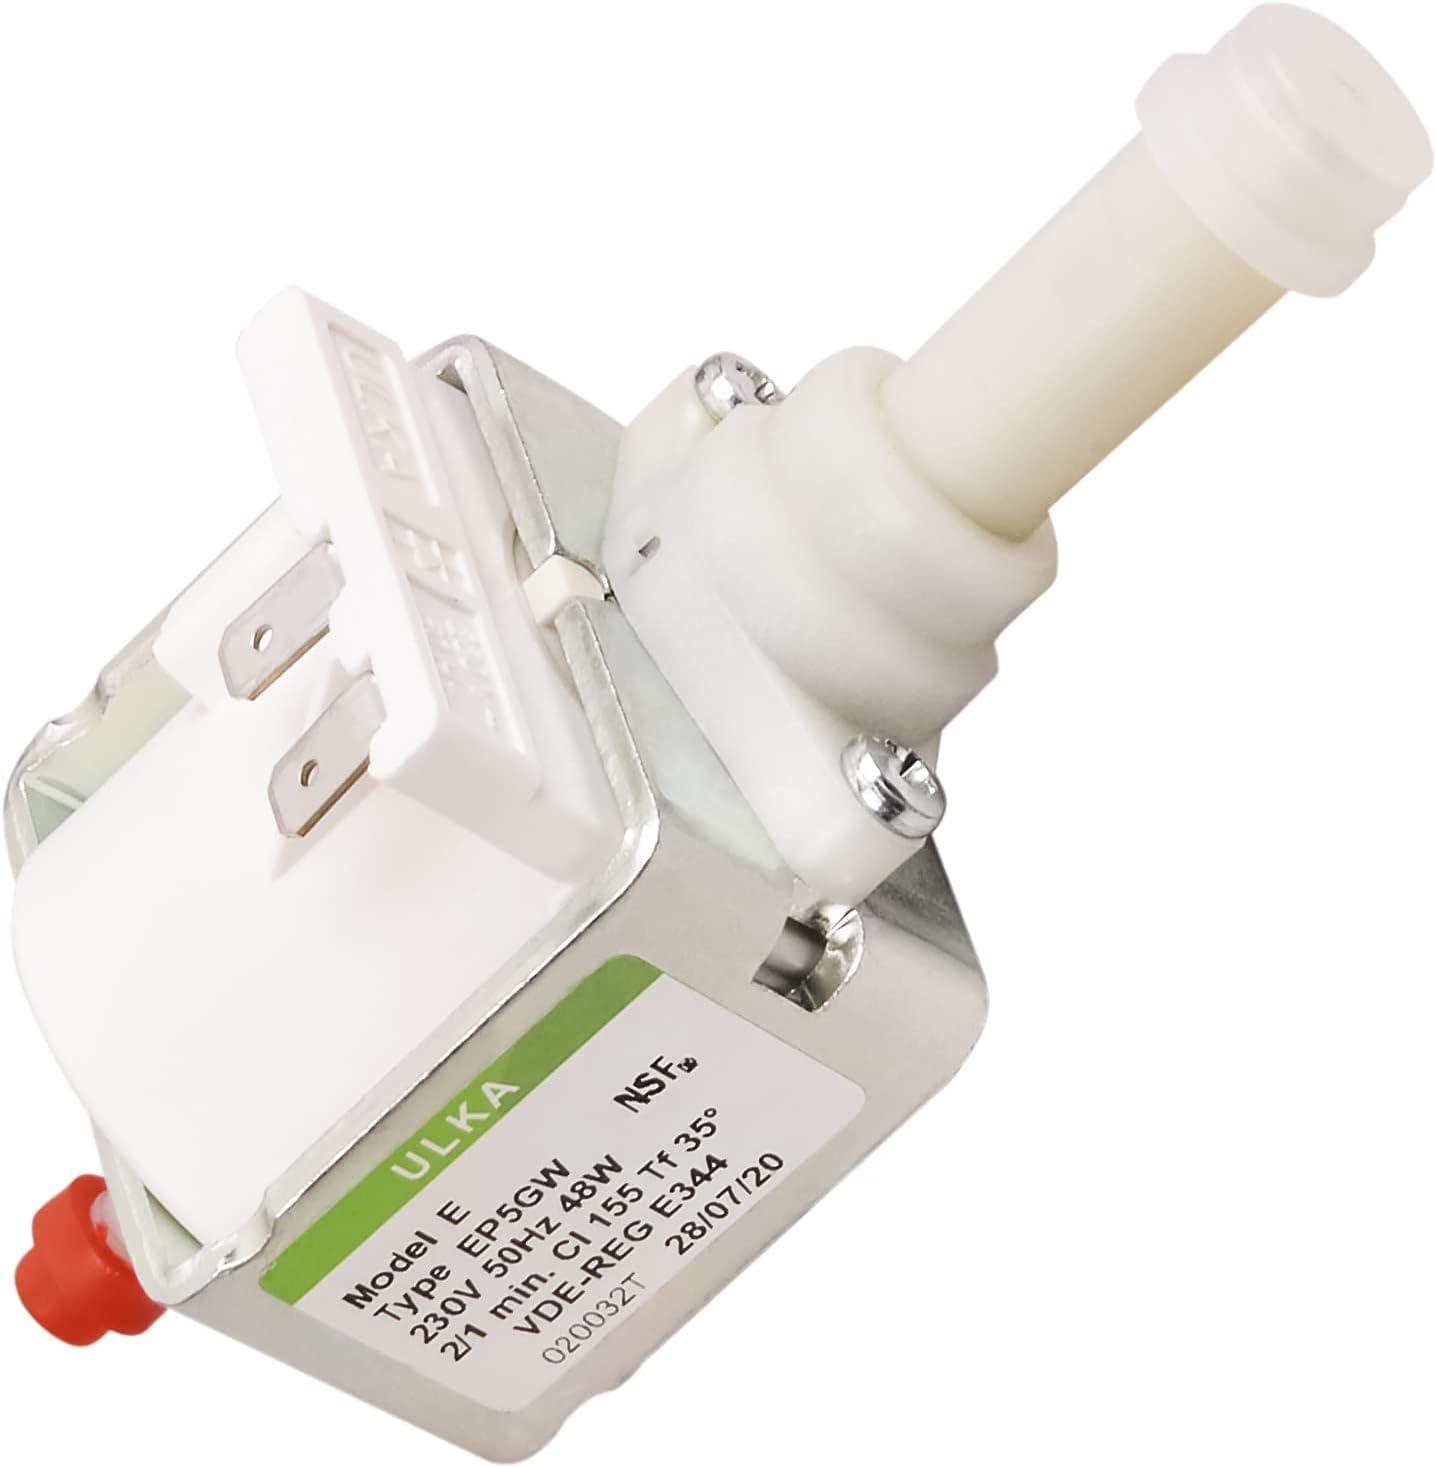 Pump Water Pump 48W 230V Ulka EP5GW for DeLonghi Saeco Coffee Machines Org